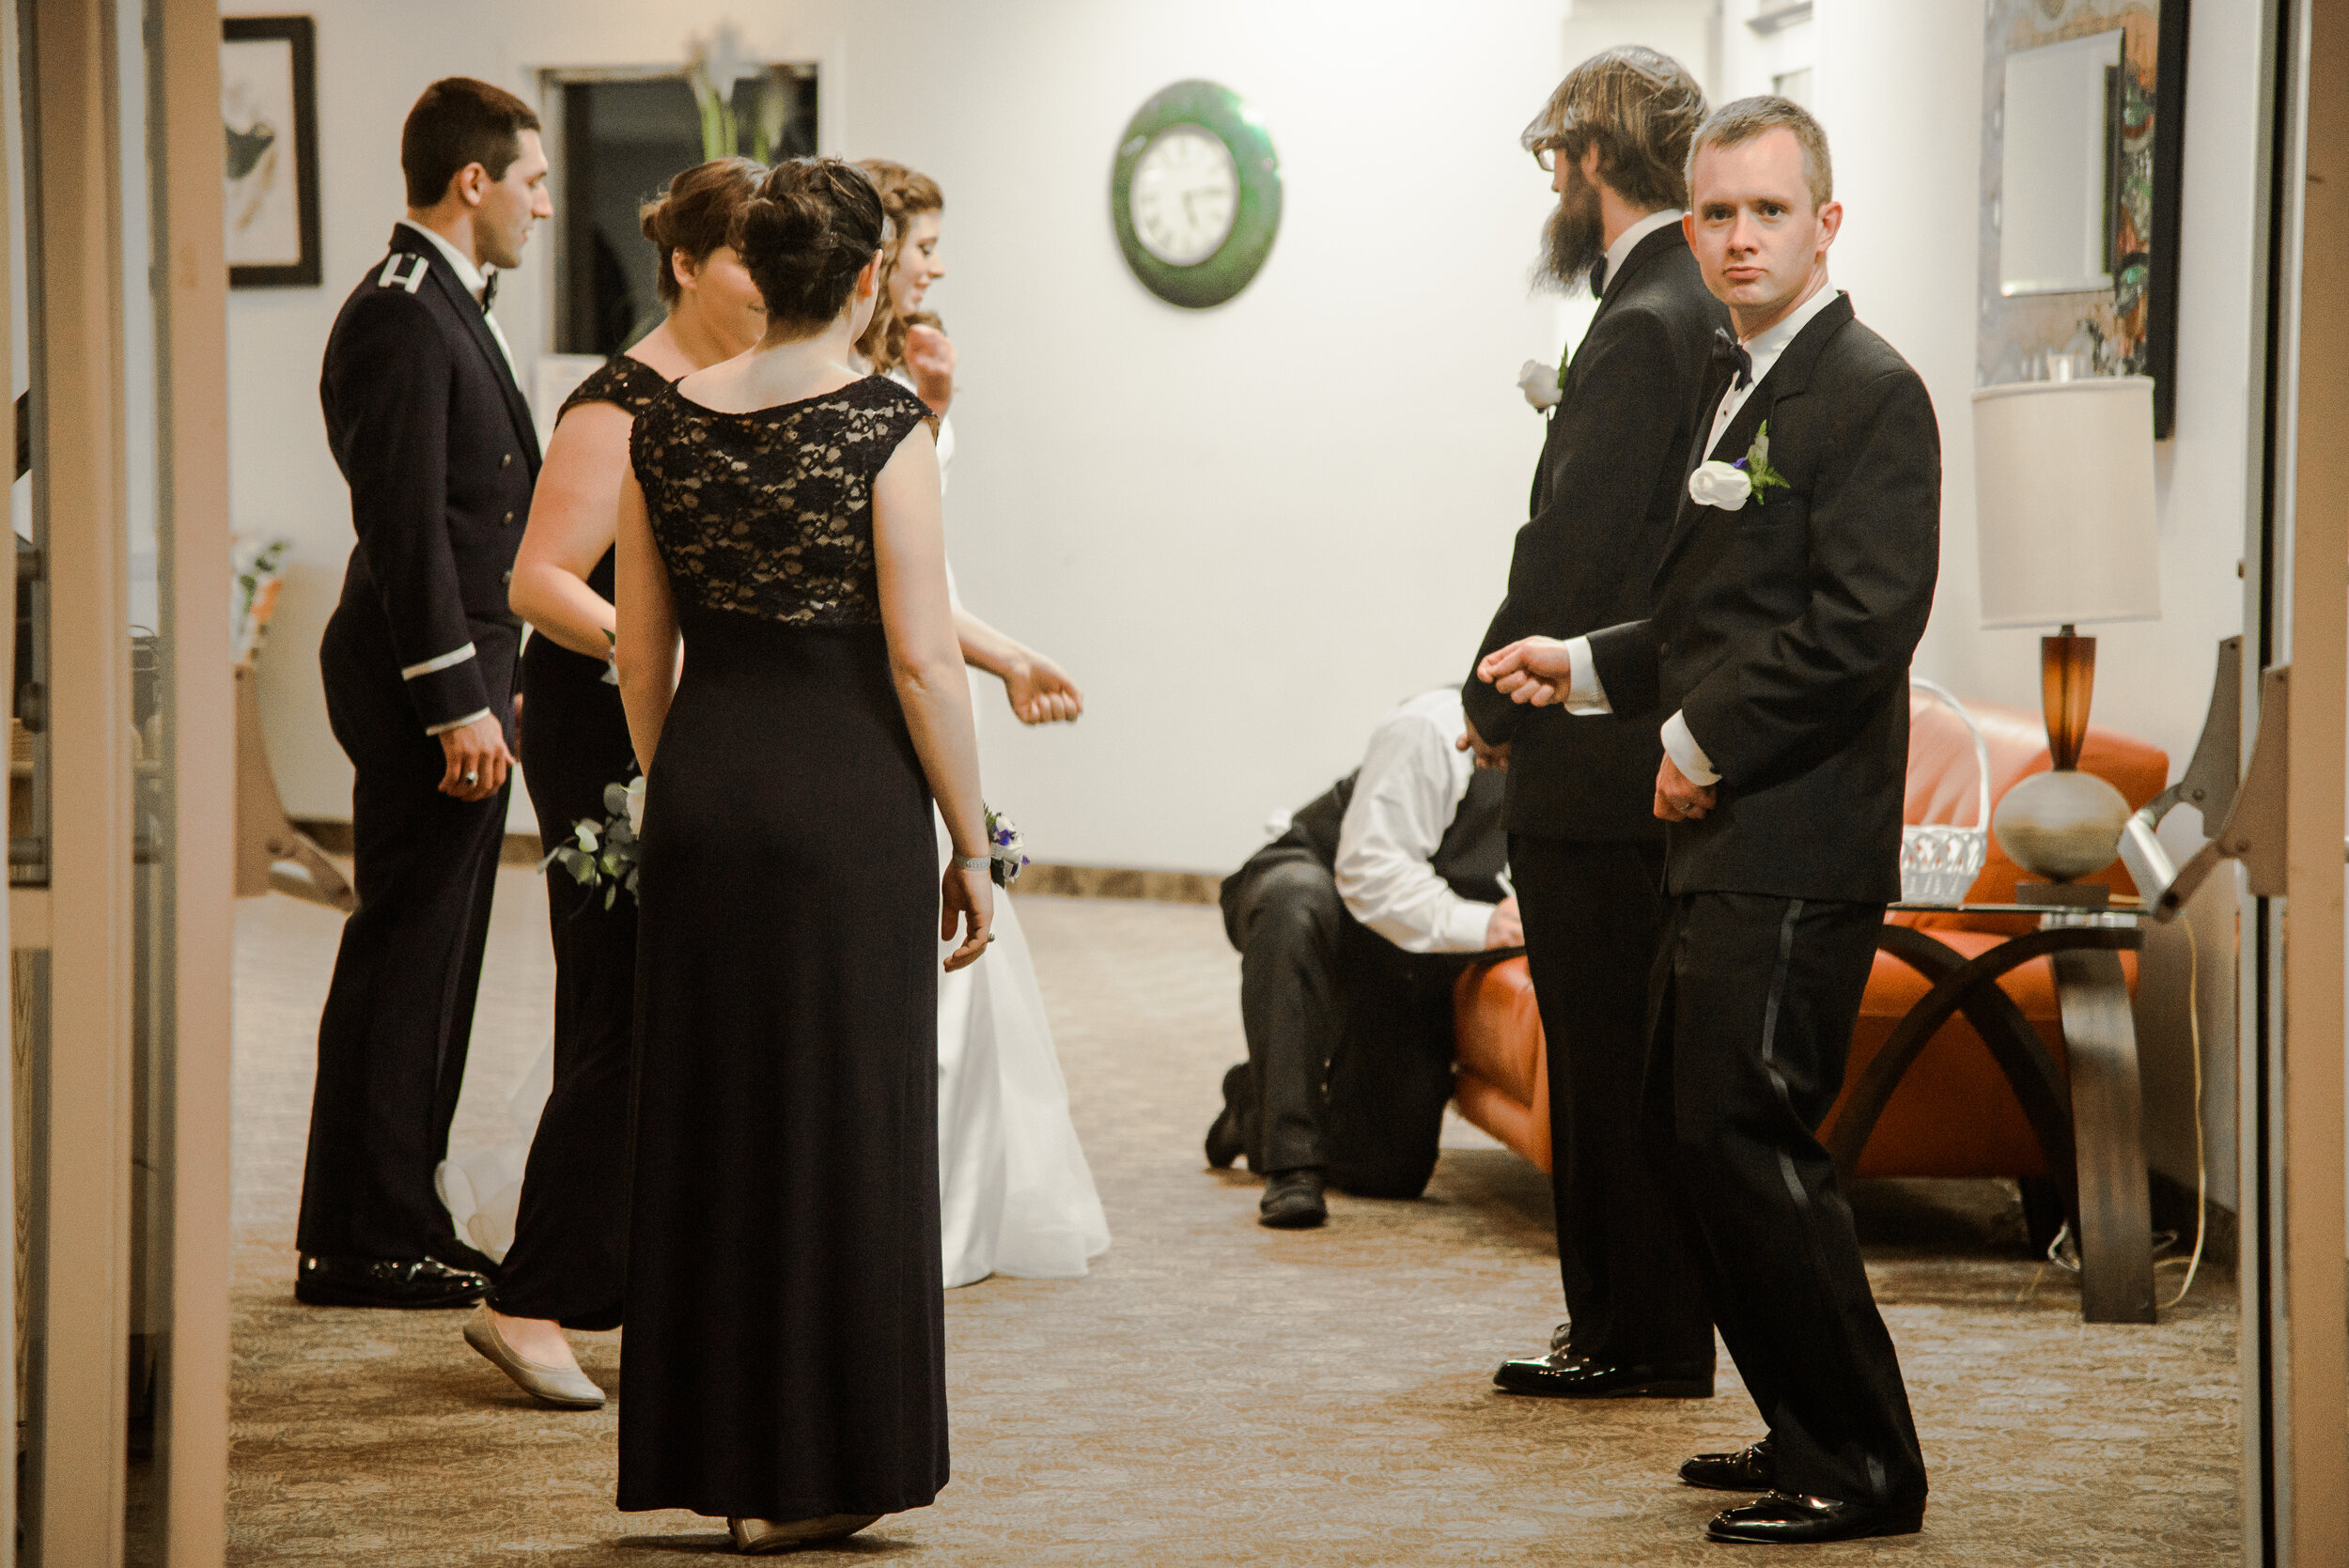 andru-the-tide-club-air-force-wedding-patrickafb-1-76.jpg